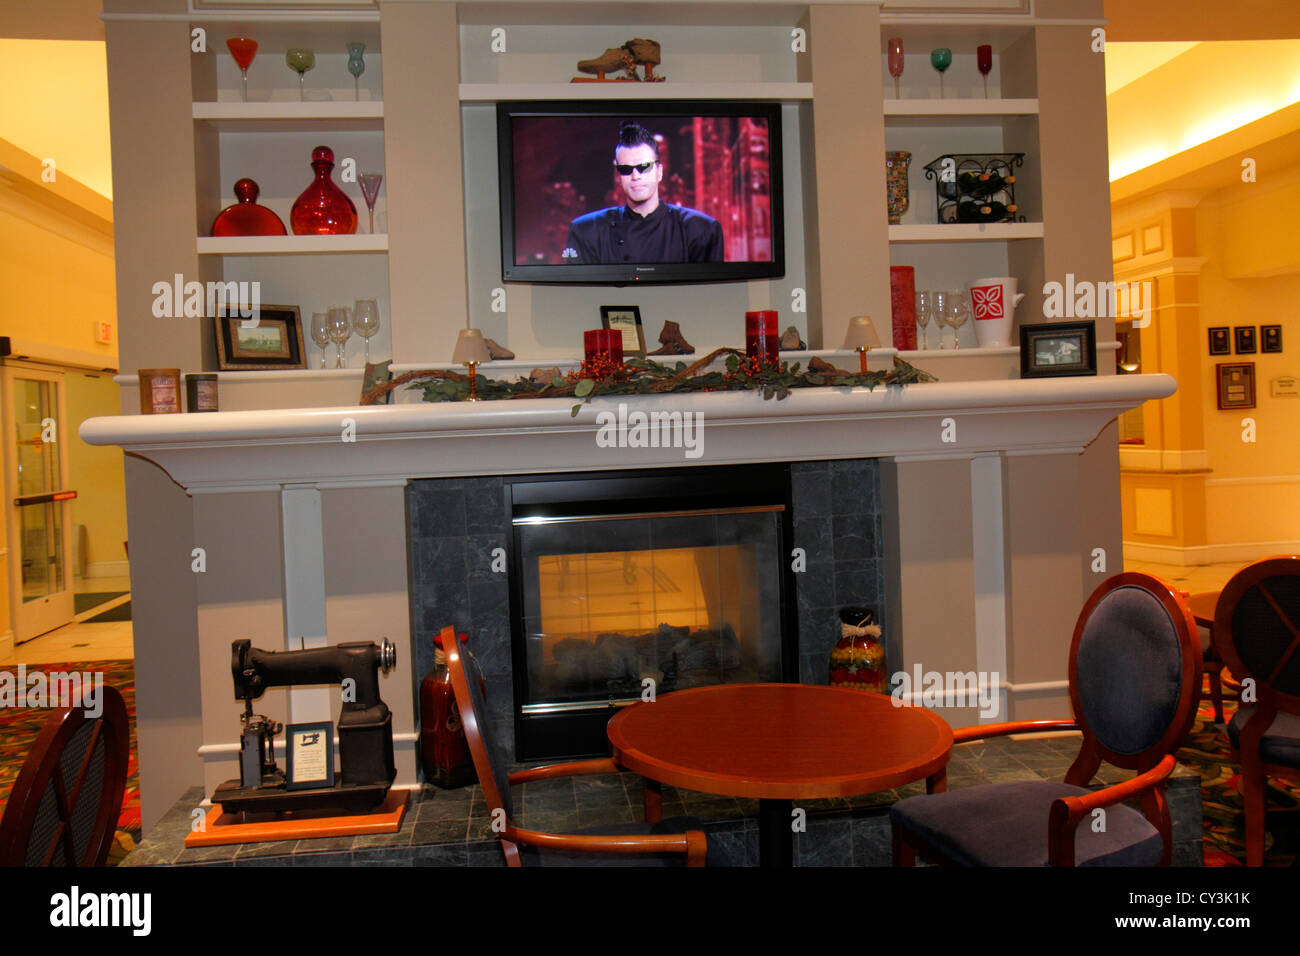 maine freeport hilton garden inn motel hotel lobby fireplace decor decoration flat screen panel tv